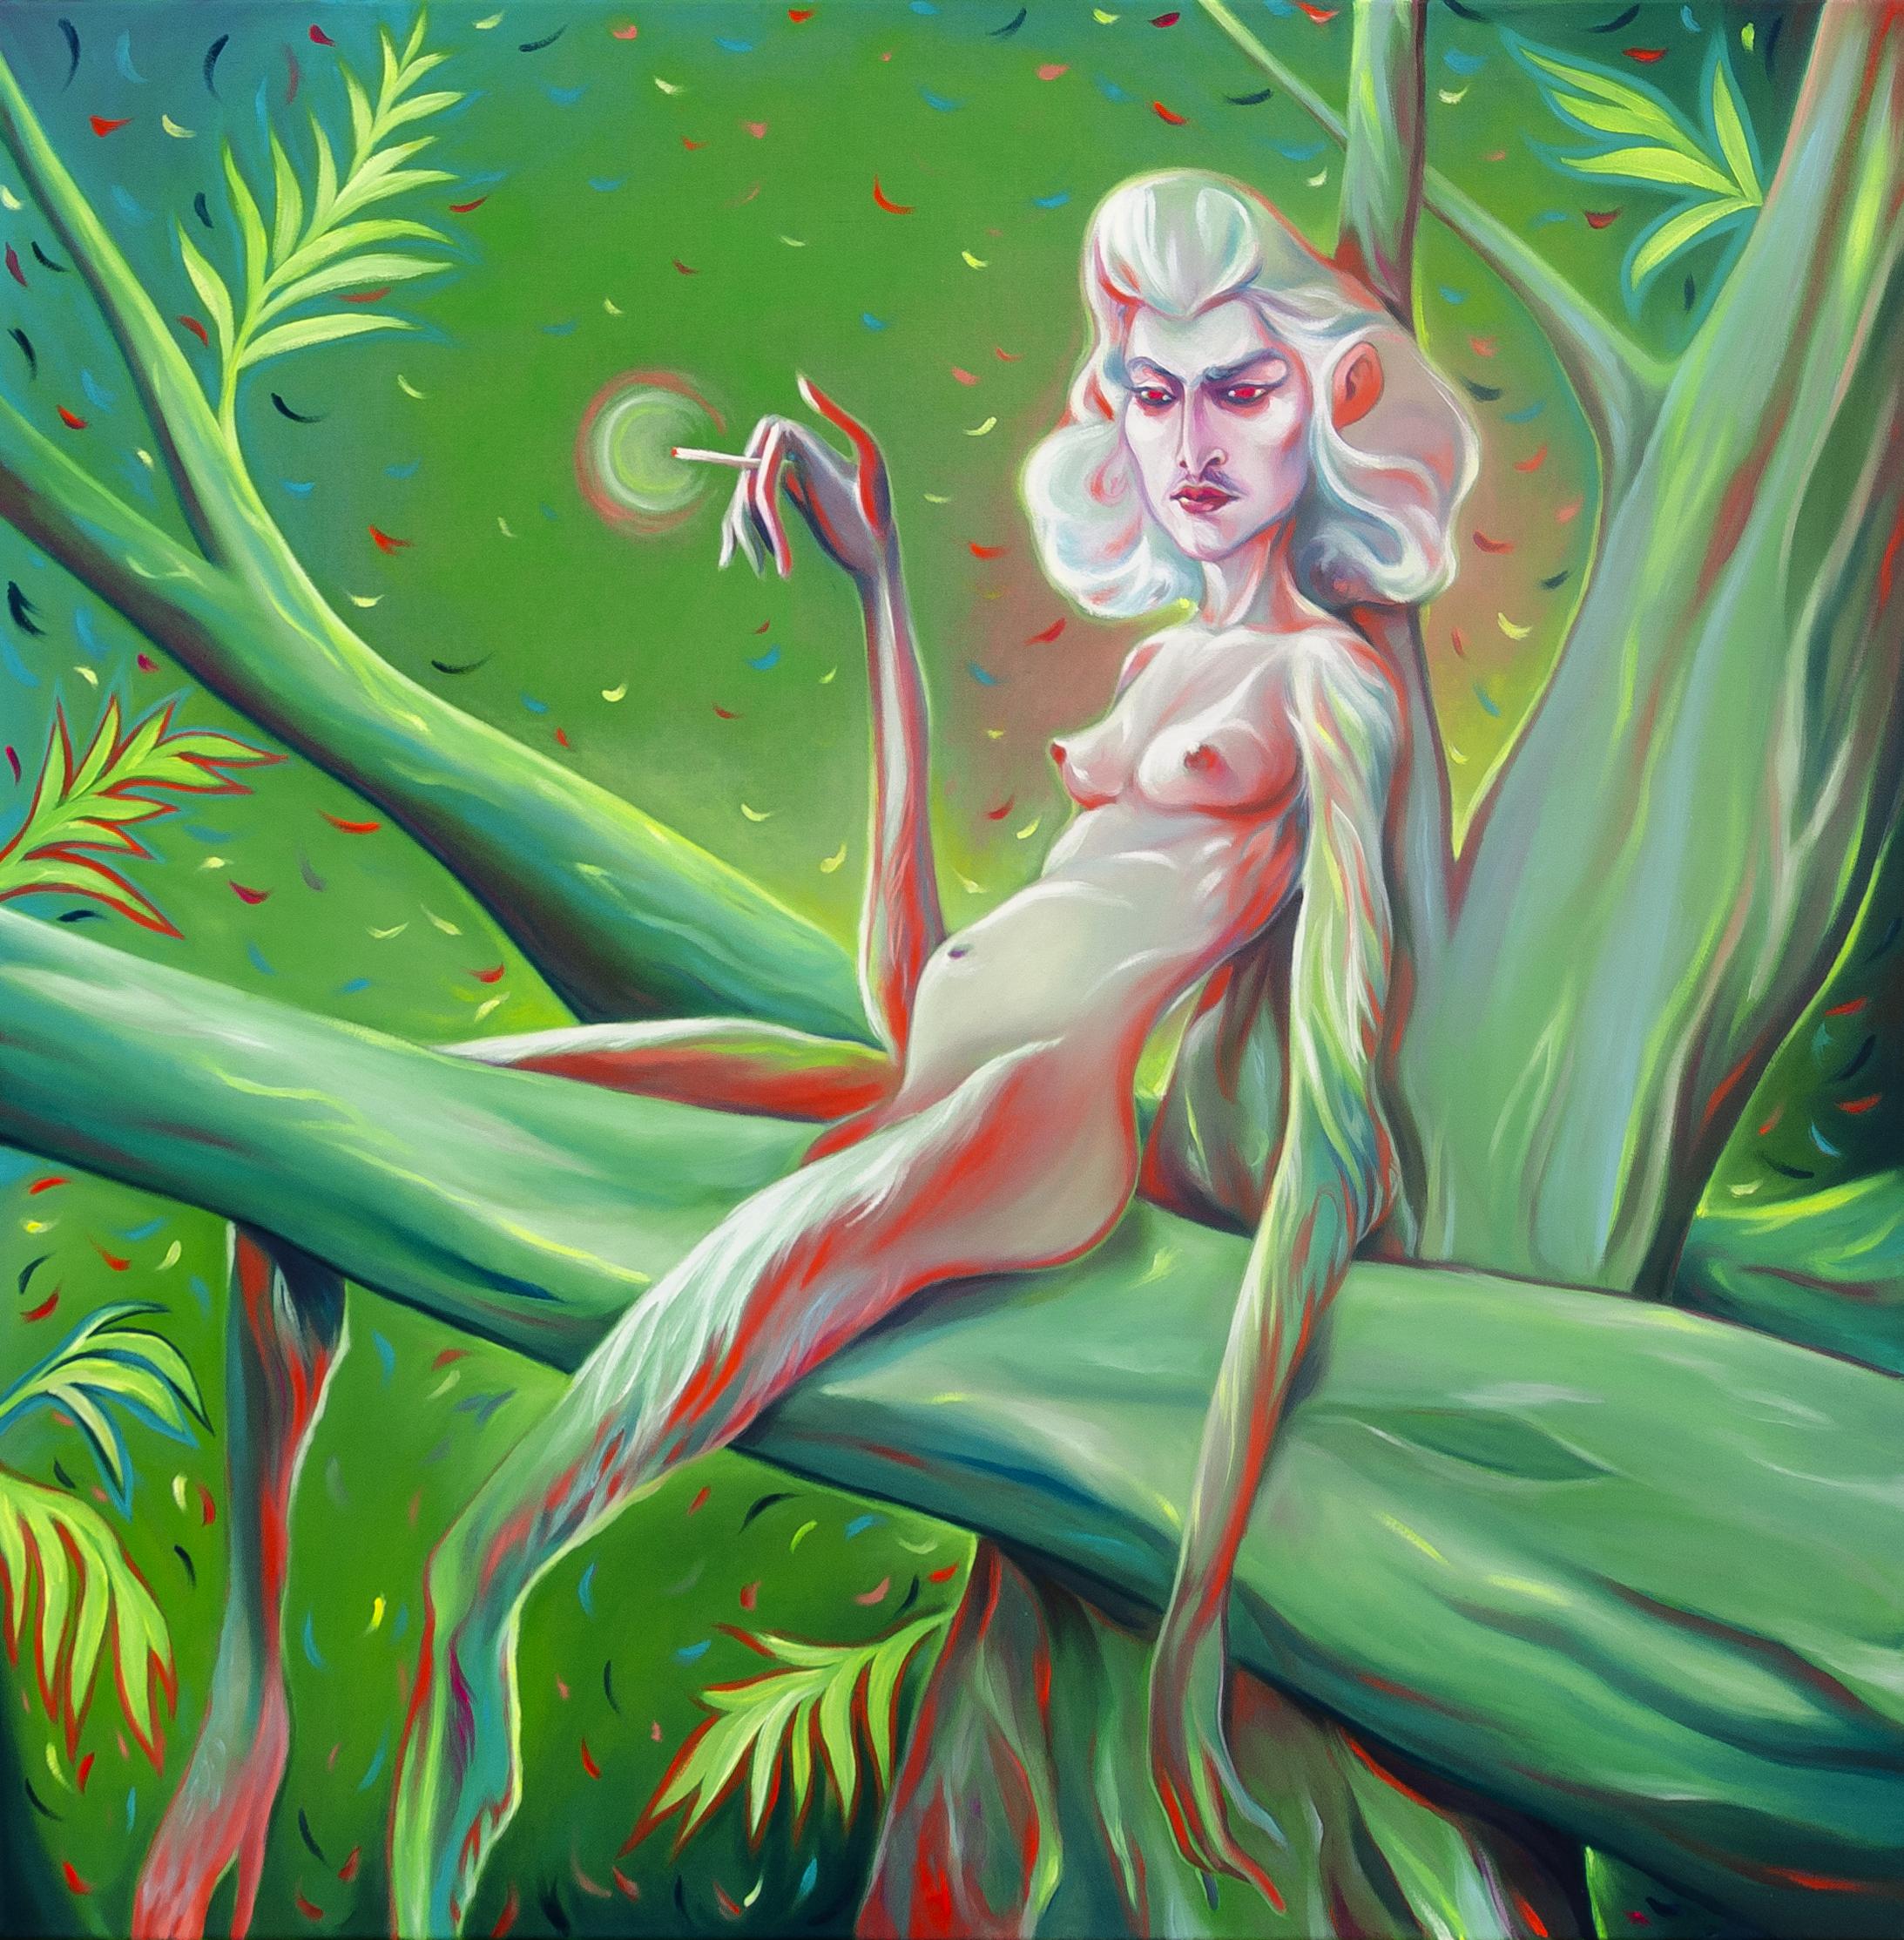 Luigi Presicce - Homo Sapiens Sapiens Sapiens (Anna che fuma) - 2020 - Olio su tela - 100x100cm - fot_n_ 2389 - Cod_8Pre2020